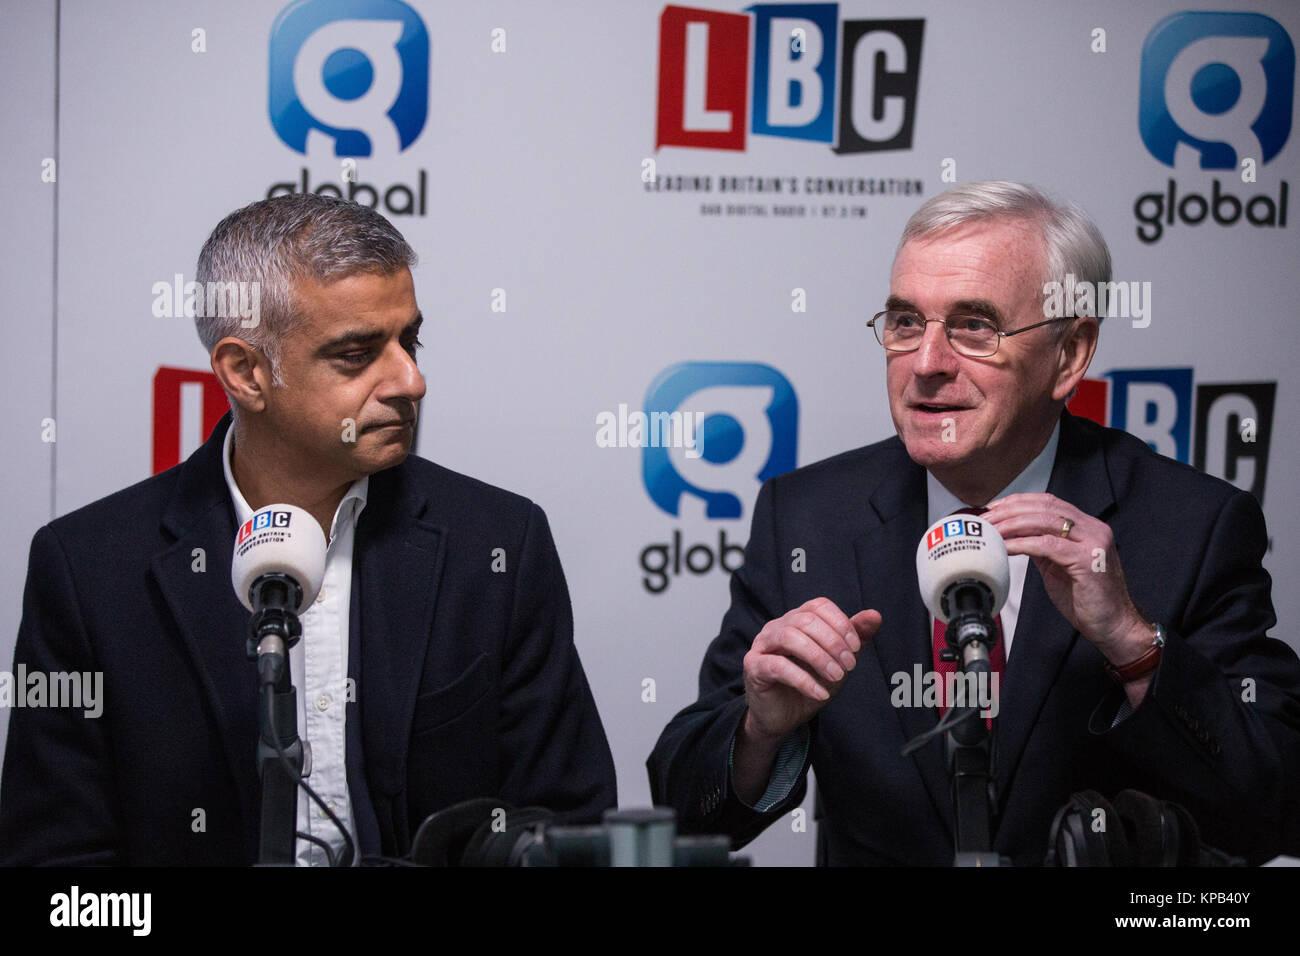 London, UK. 22nd November, 2017. Sadiq Khan, Mayor of London, and John McDonnell MP, Shadow Chancellor, give their - Stock Image